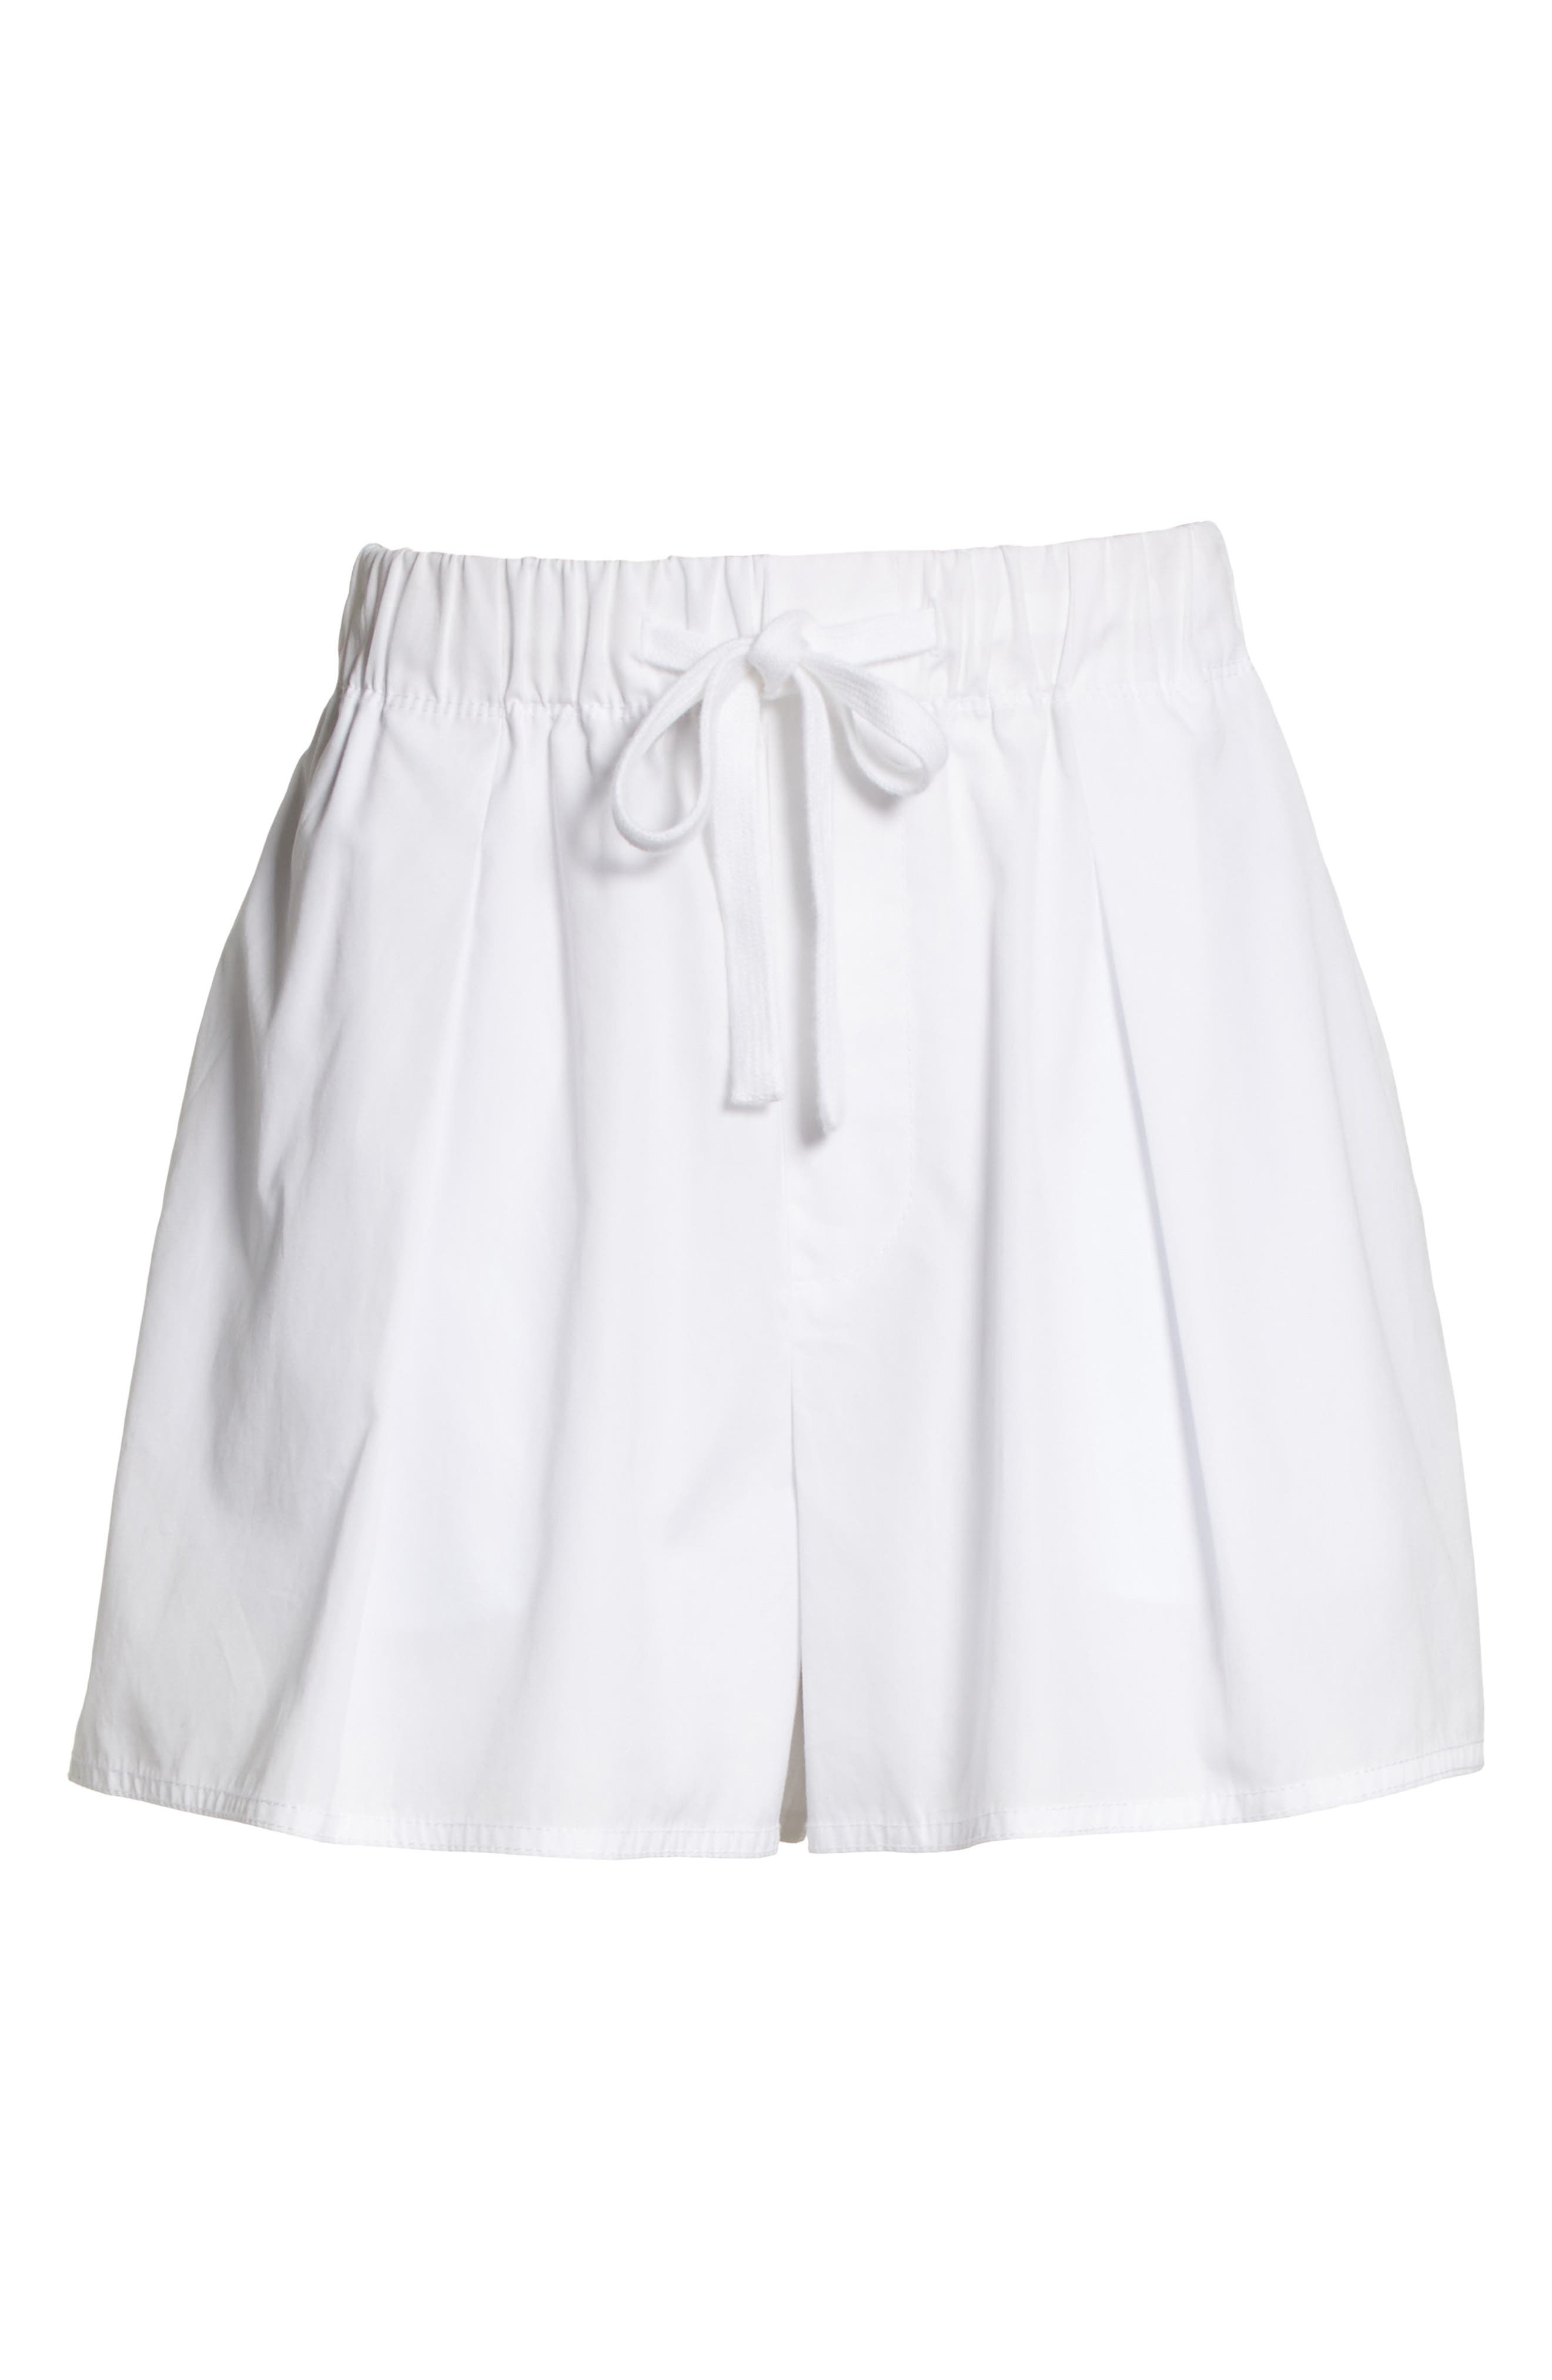 Drawstring Cotton Shorts,                             Alternate thumbnail 6, color,                             100